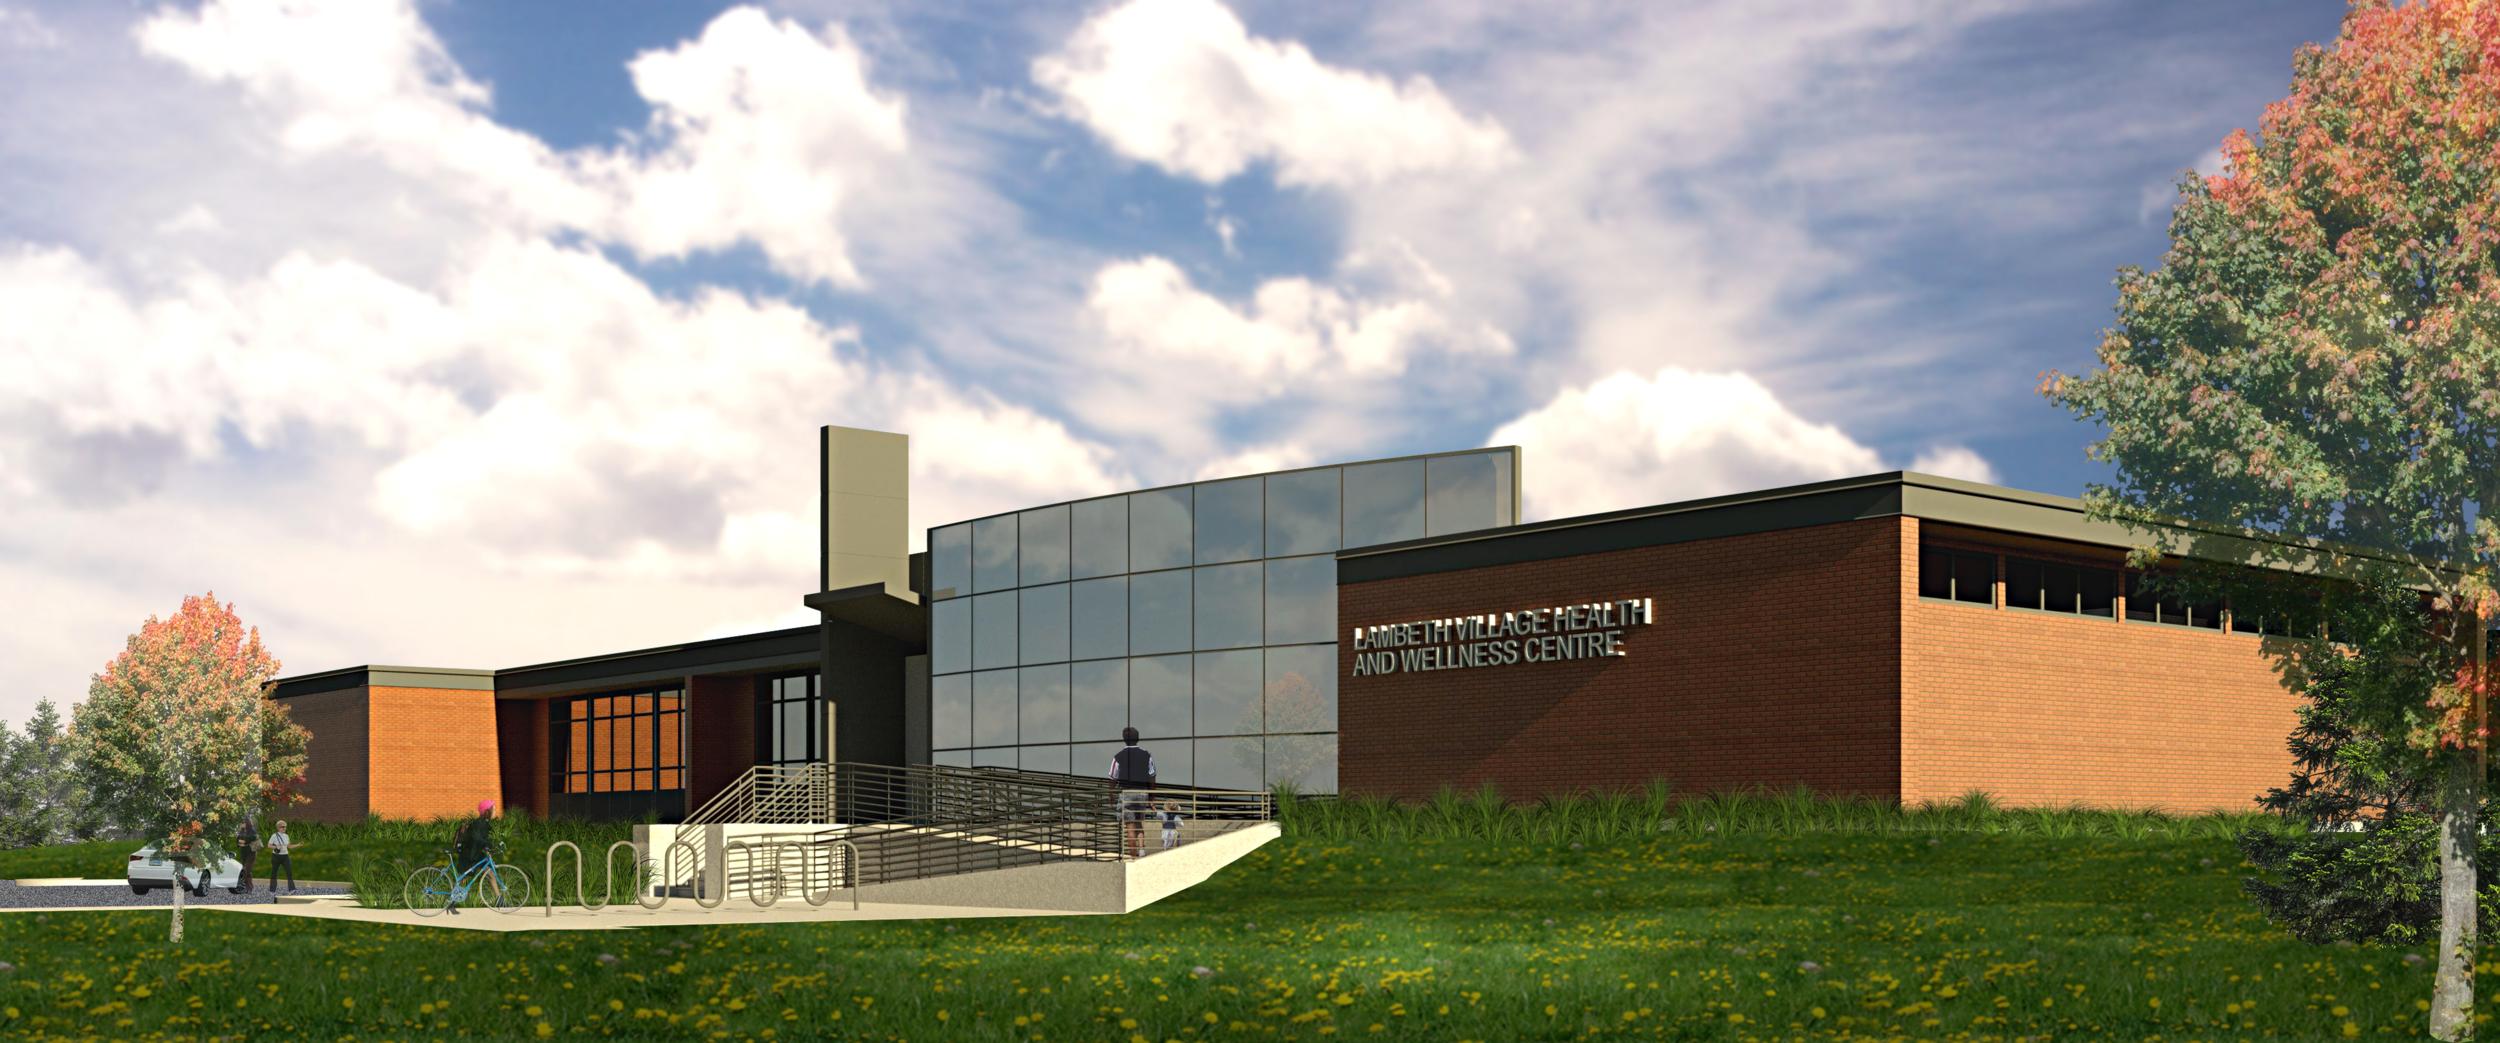 Lambeth Village Health And Wellness Centre (In Progress) | London, Ontario